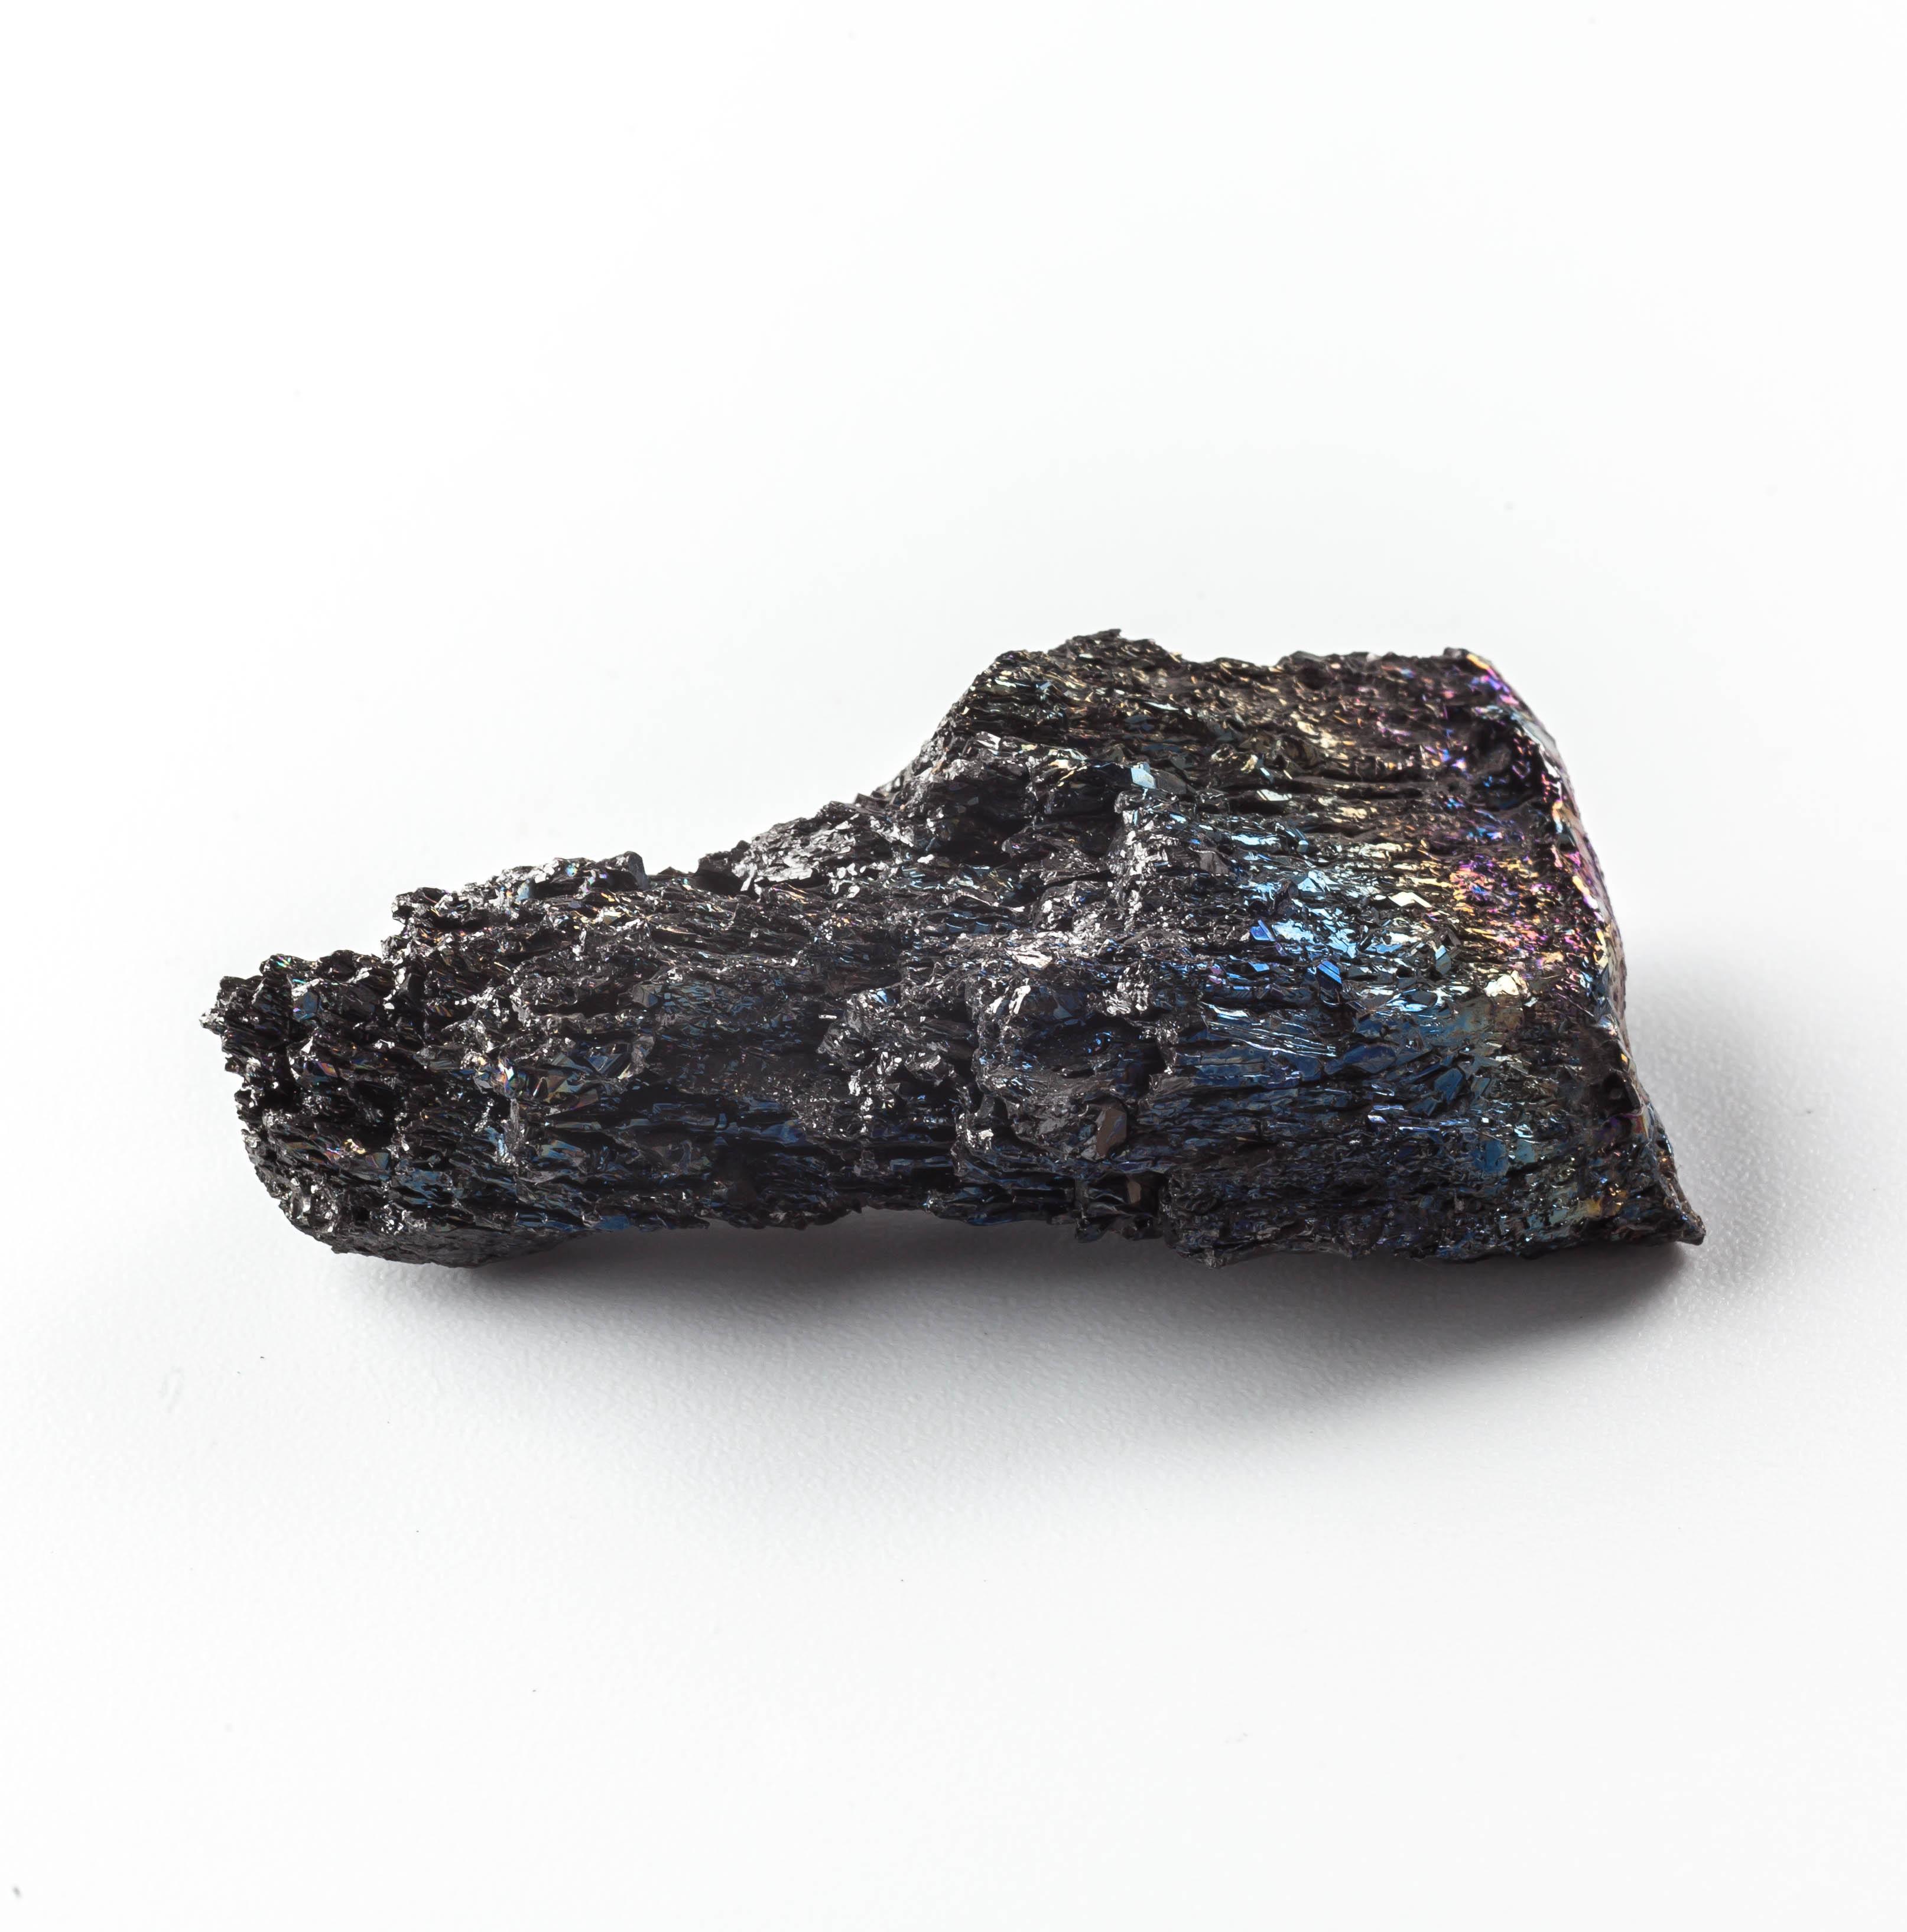 IES_SANISIDRO_MUSEO_Geologia_029